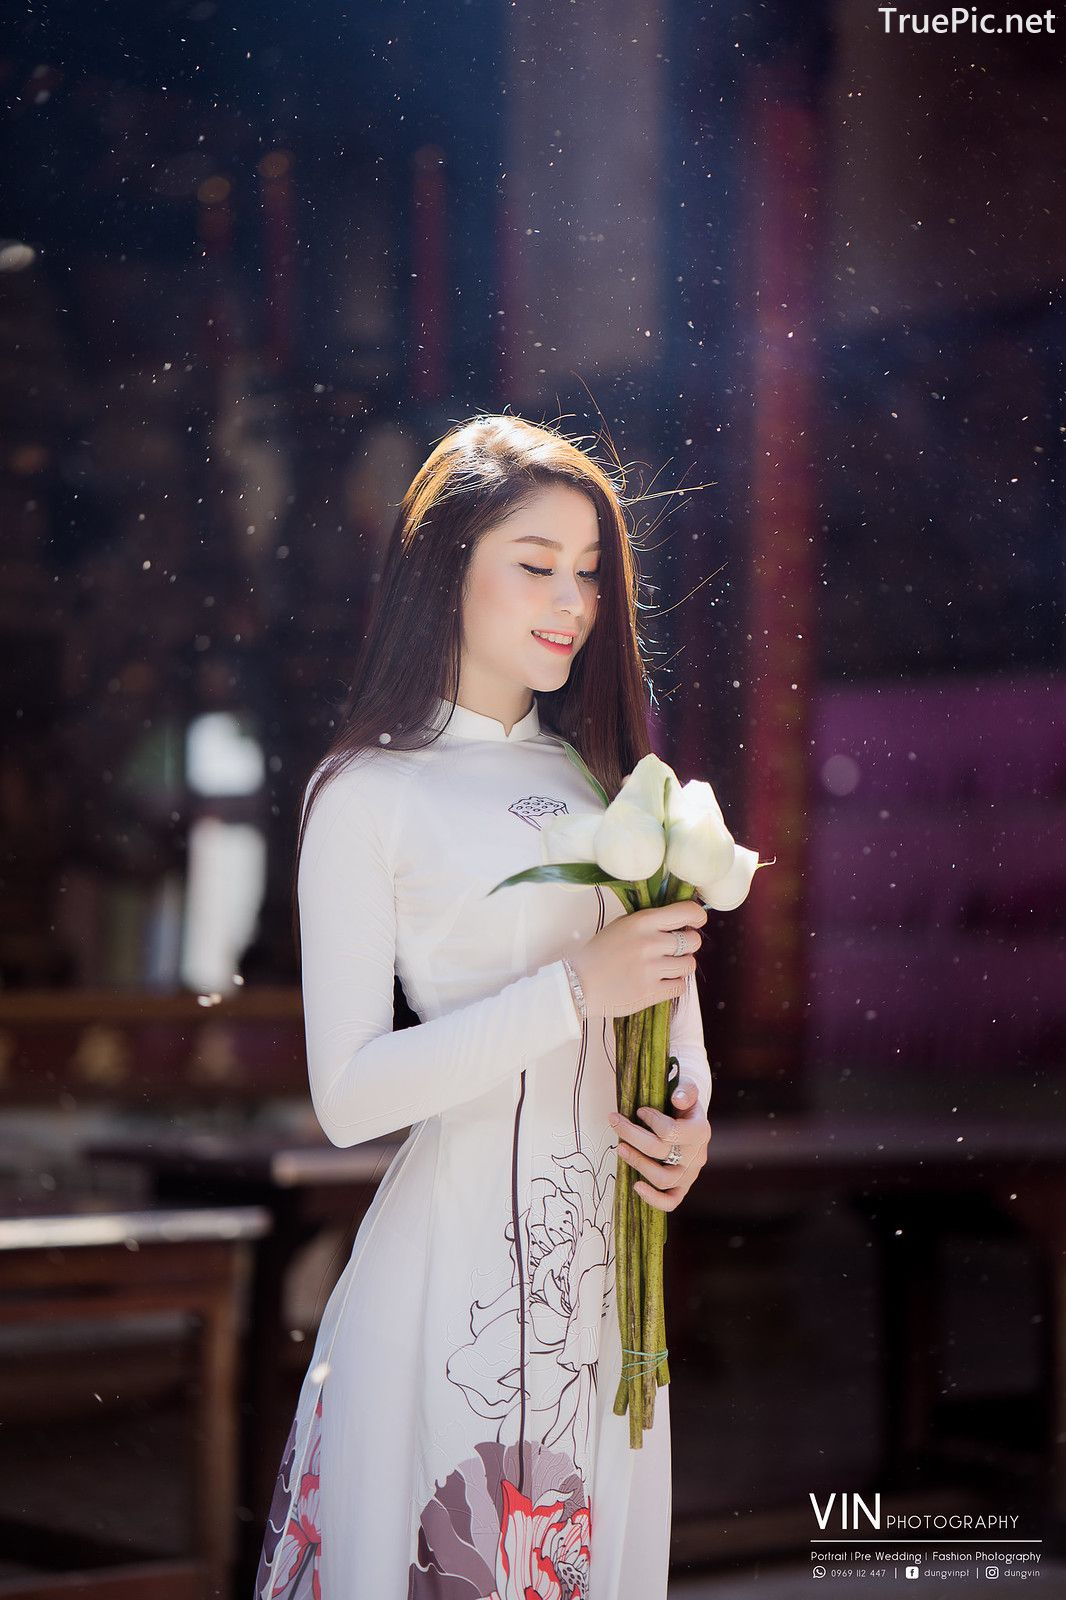 Image-Vietnamese-Beautiful-Girl-Ao-Dai-Vietnam-Traditional-Dress-by-VIN-Photo-1-TruePic.net- Picture-9